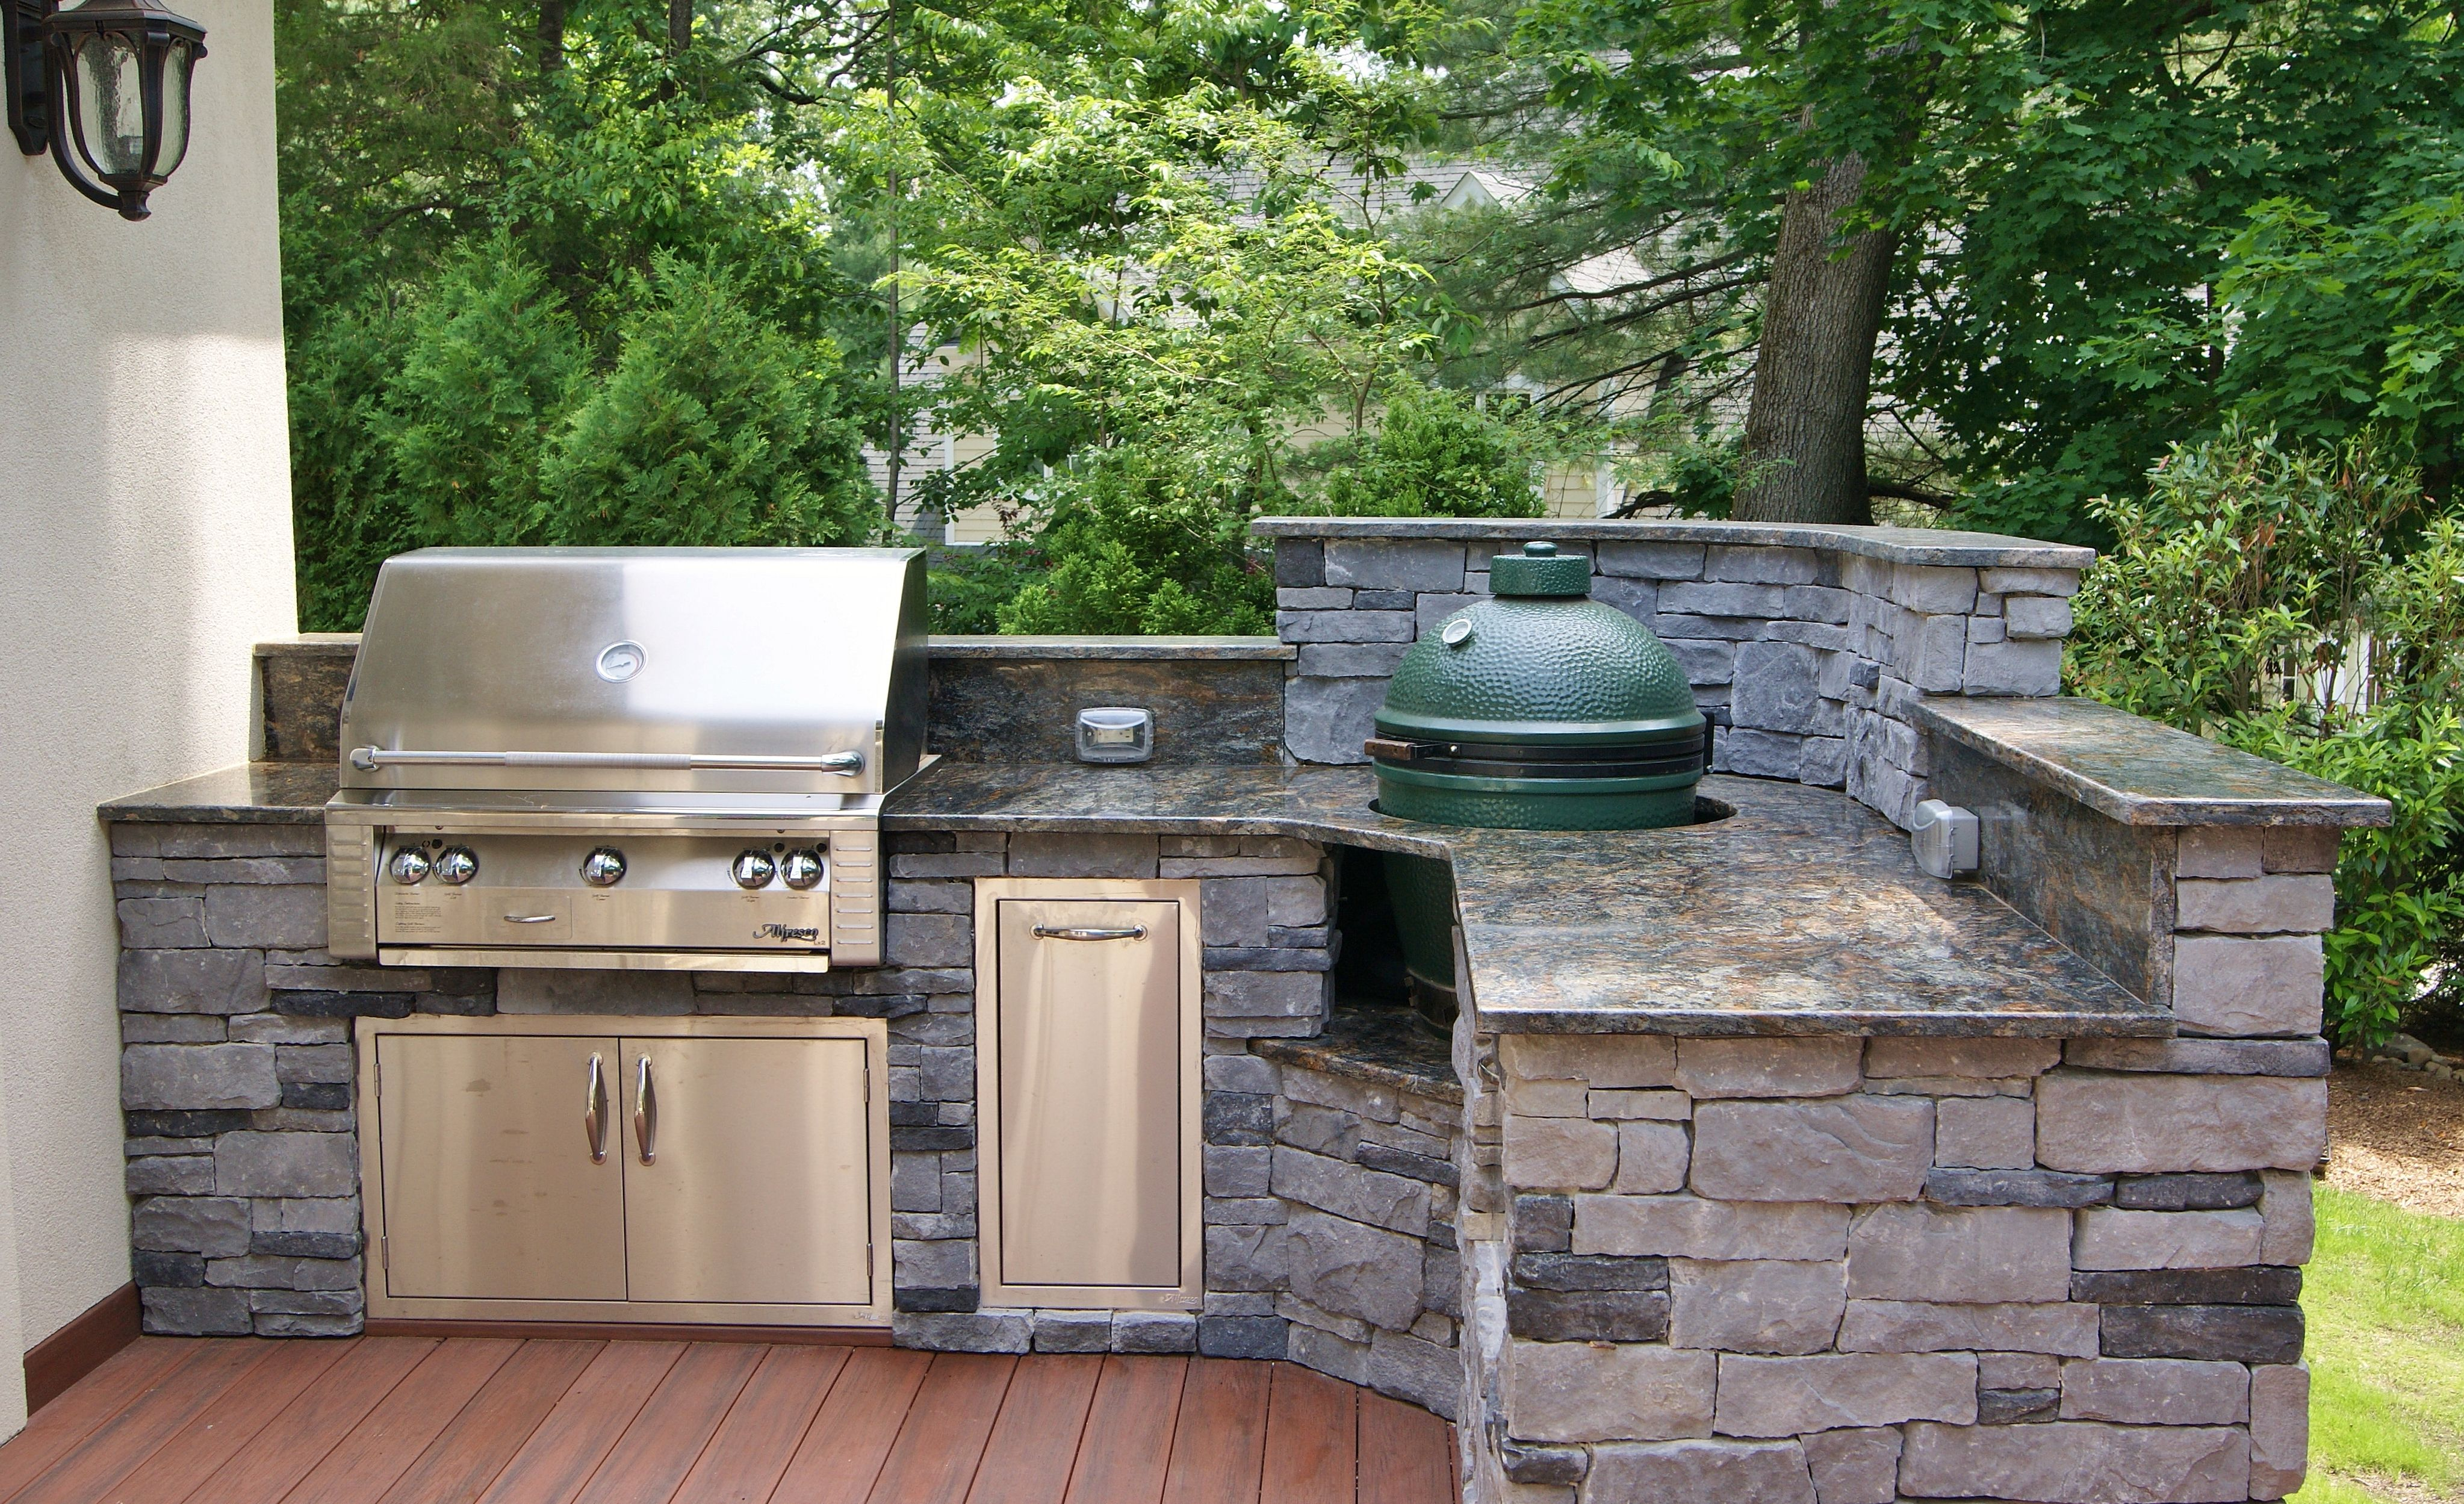 grills for outdoor kitchens moen kitchen faucet schematic photos custom big green egg